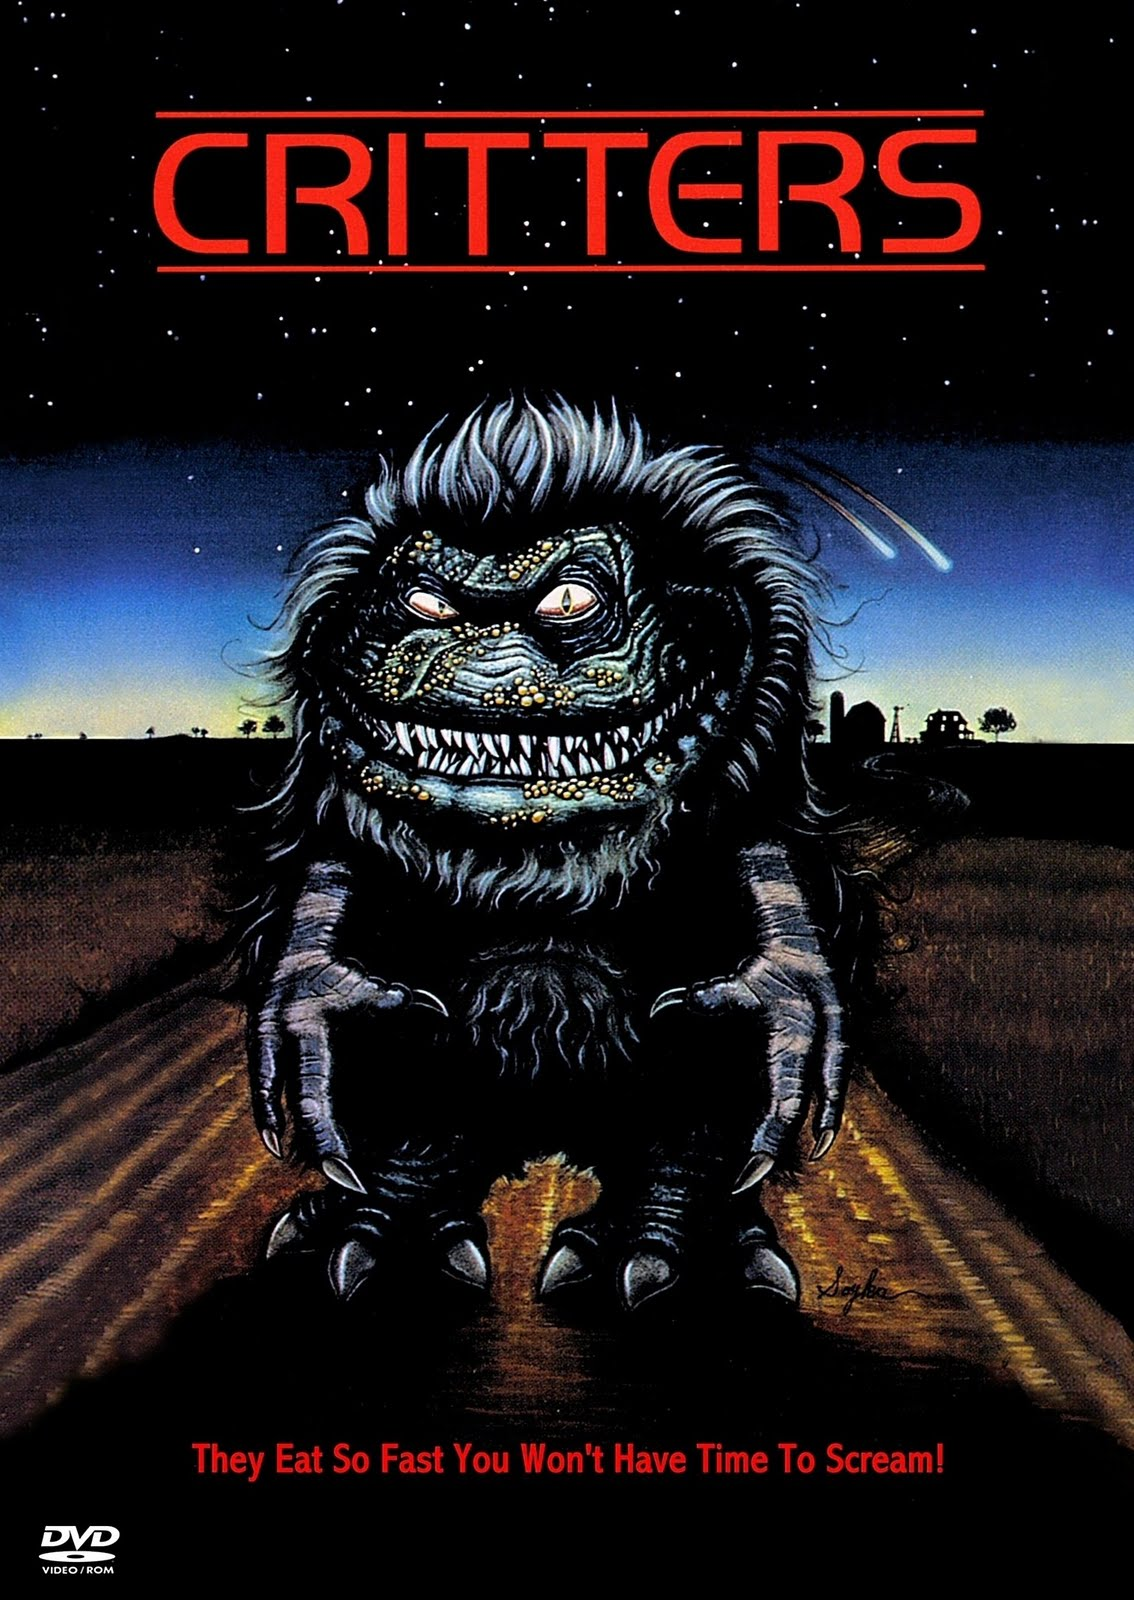 Critters-1.jpg